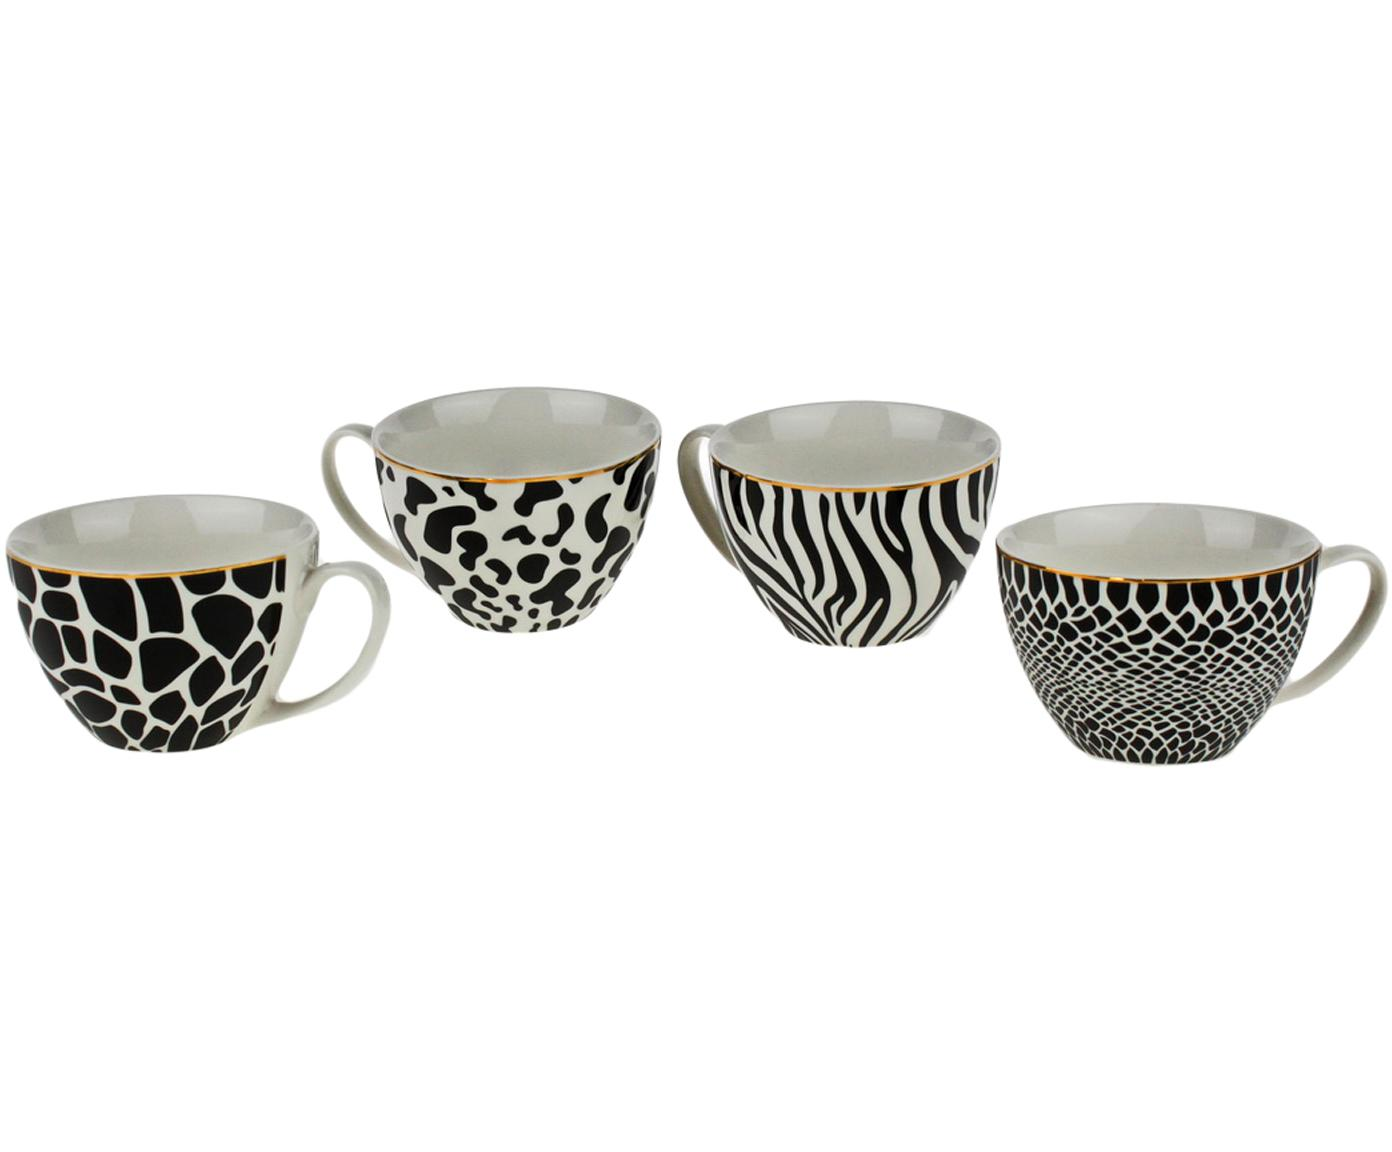 Set de tazas Wild Jungle, 4pzas., Porcelana, Blanco con manchas negras, Ø 12 x Al 8 cm